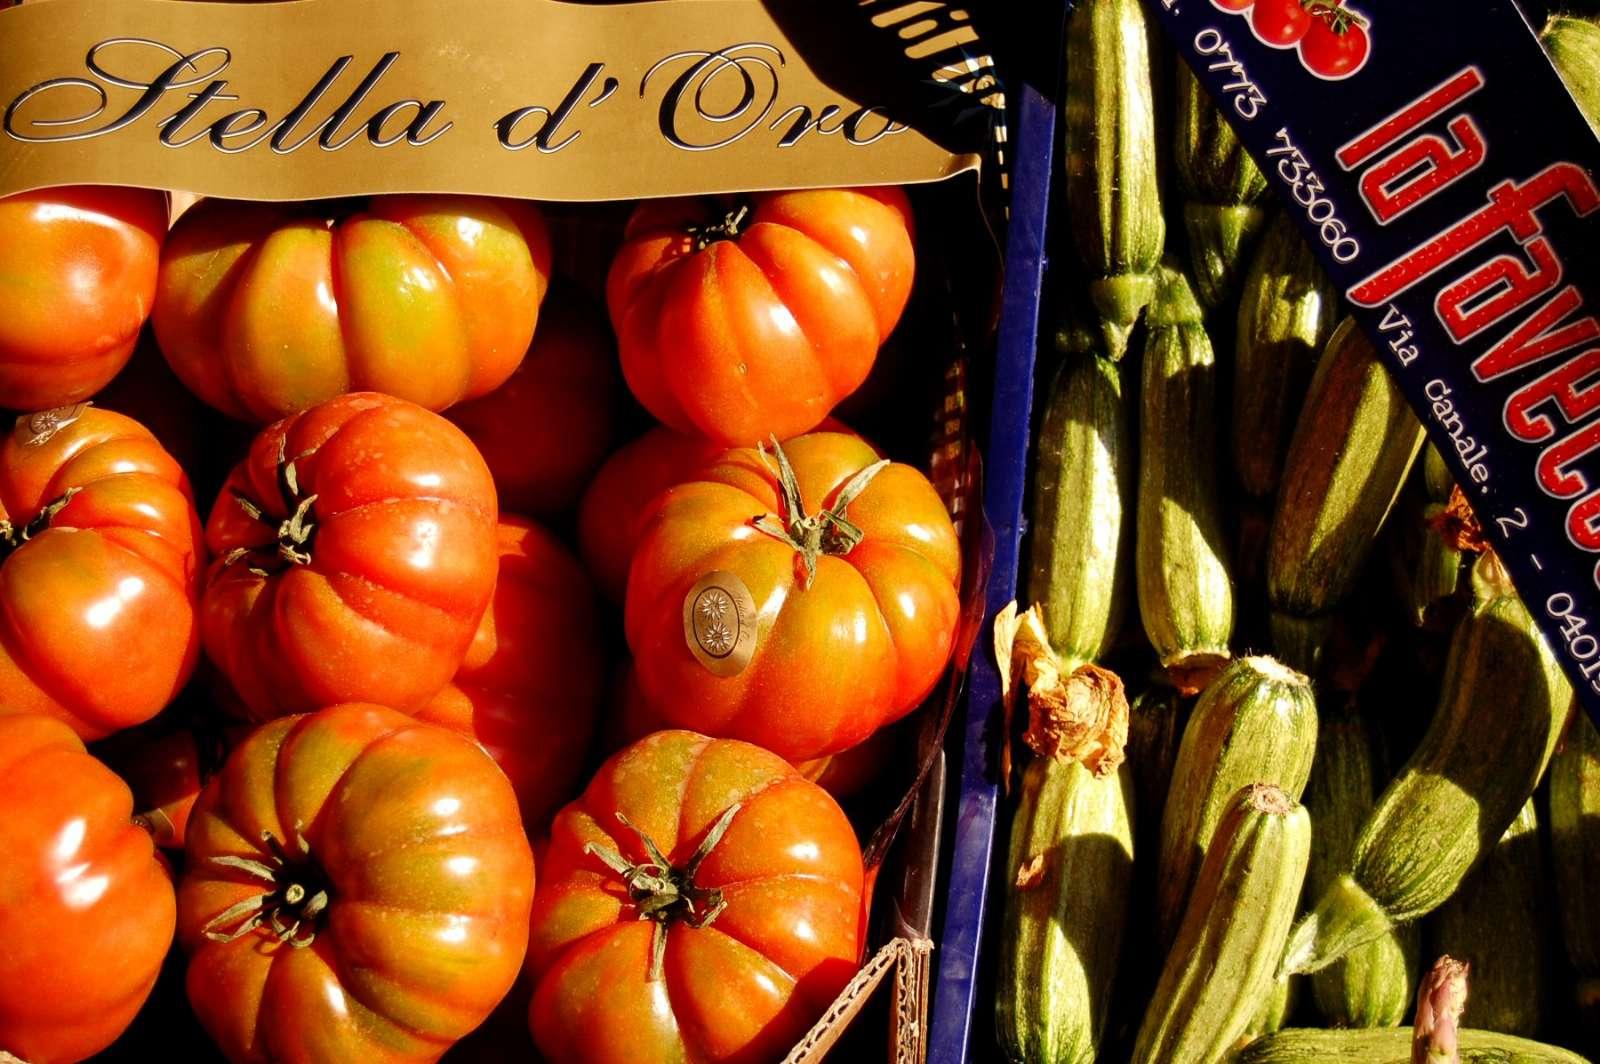 Solmodne grønsager